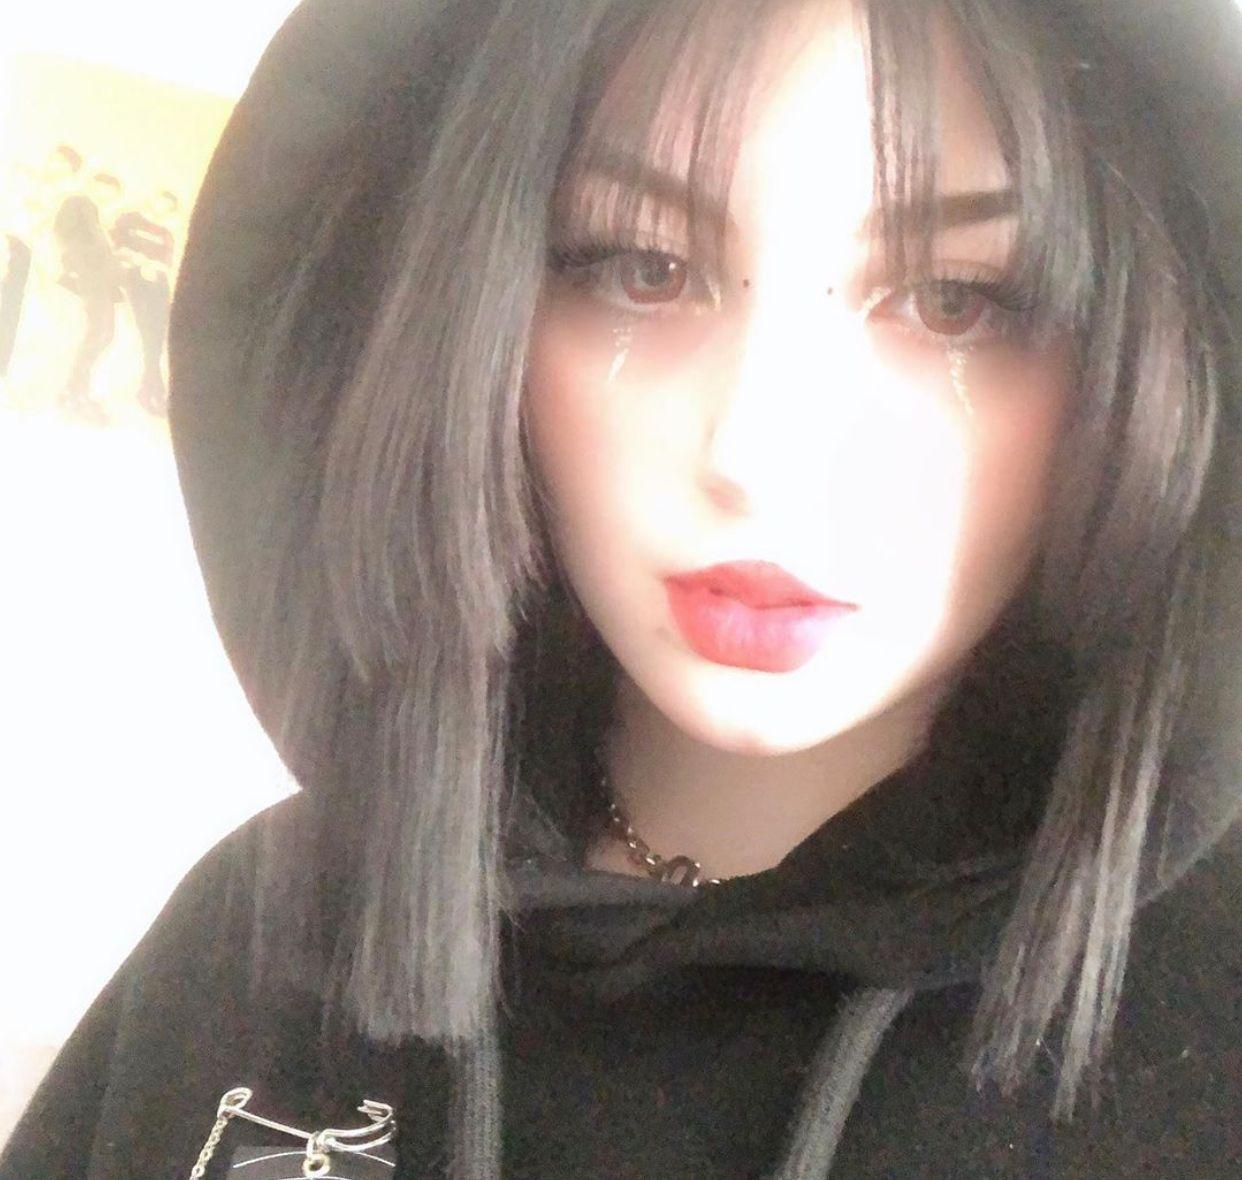 anime gf  Girl, Cute, Fashion